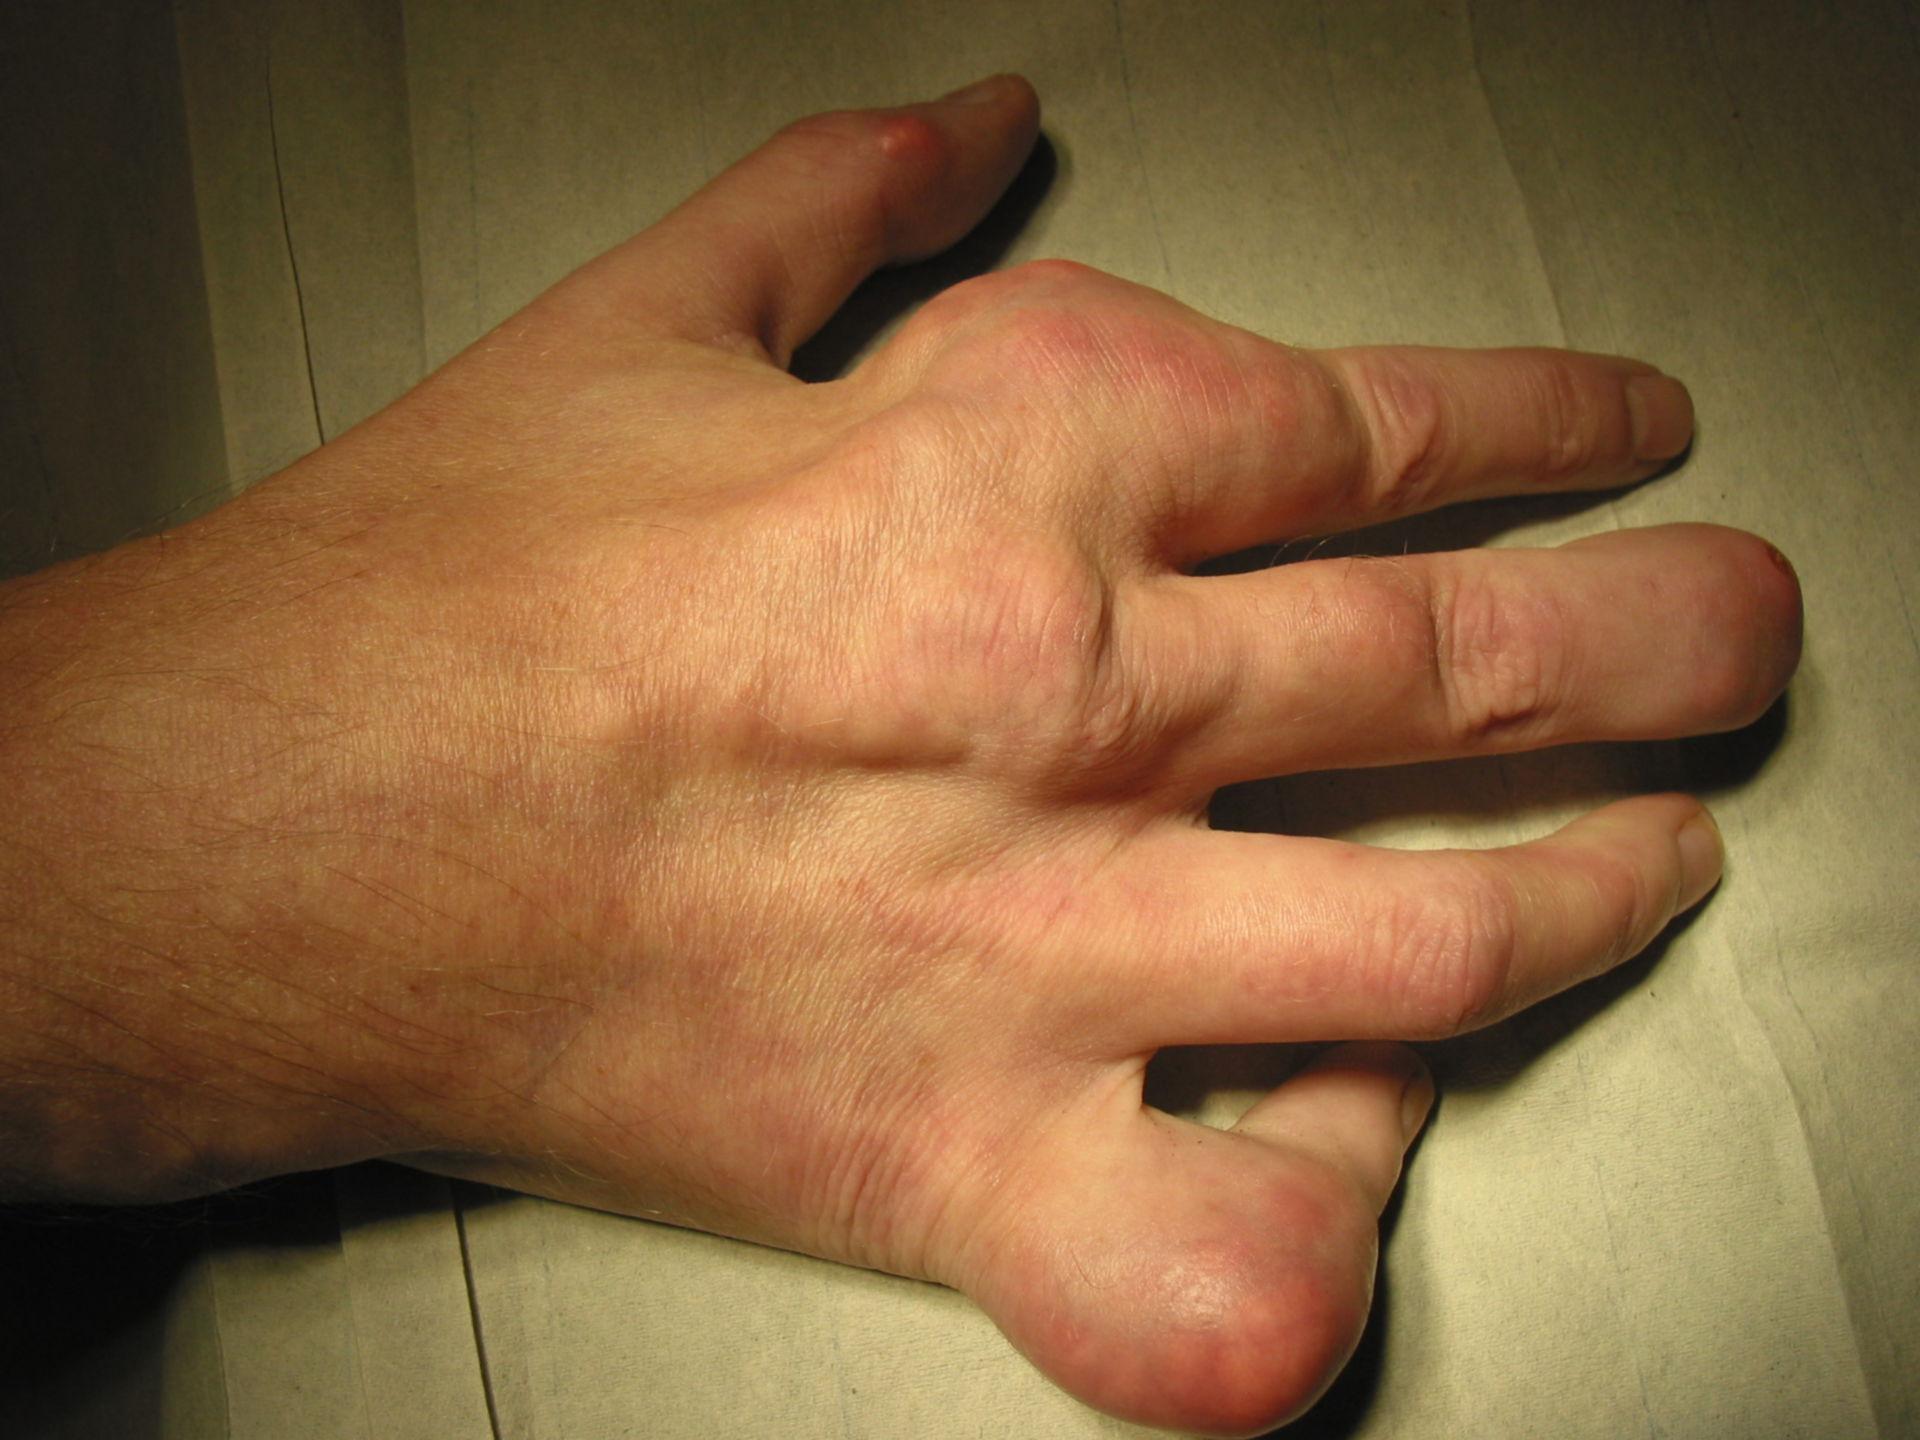 Gota afectando la mano derecha